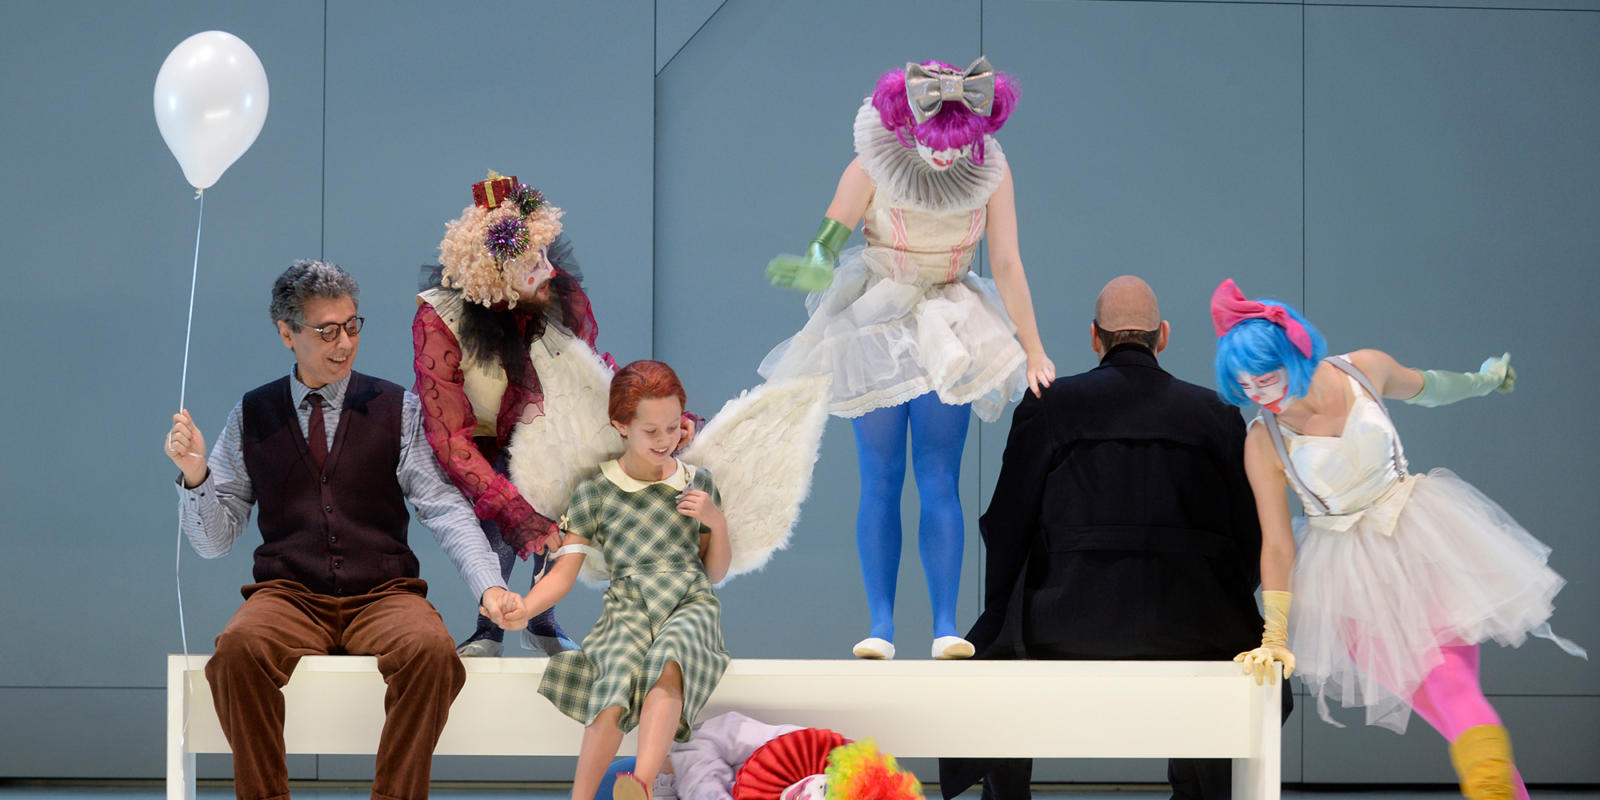 ENO1920 Luisa Miller: Anton Keremidtchiev as Miller in Oper Wuppertal's production (c) Jens Grossmann